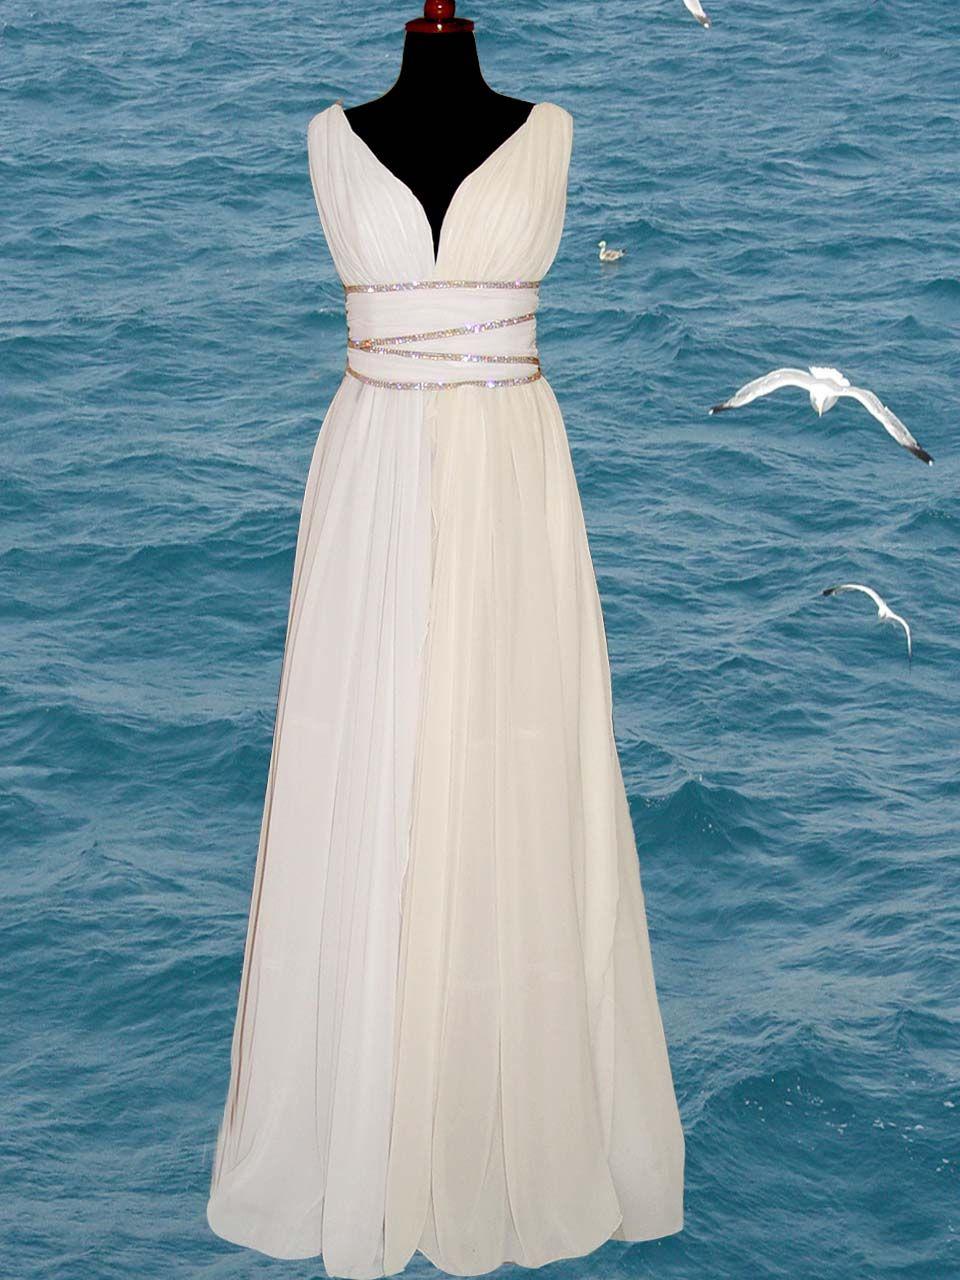 Grecian Style dress | Princess leia dress, Princess leia and Princess